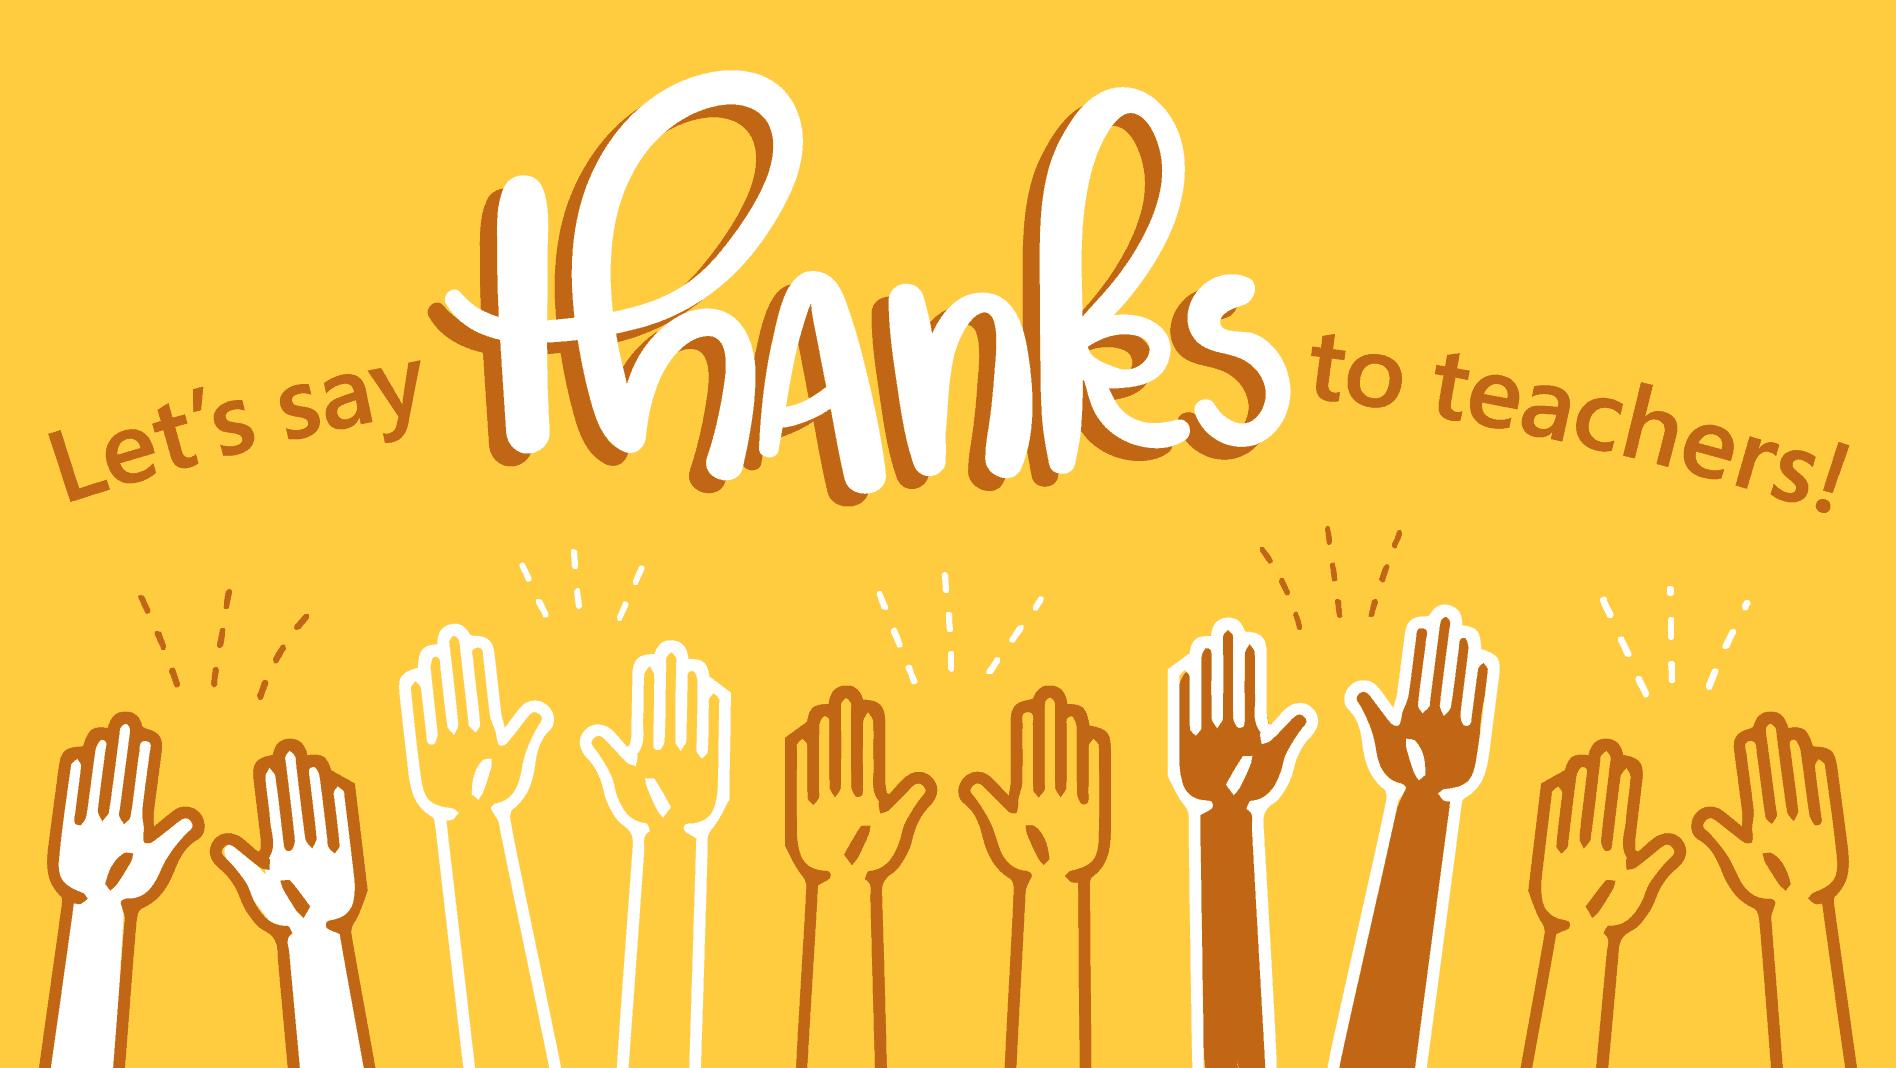 Thank you, teachers.